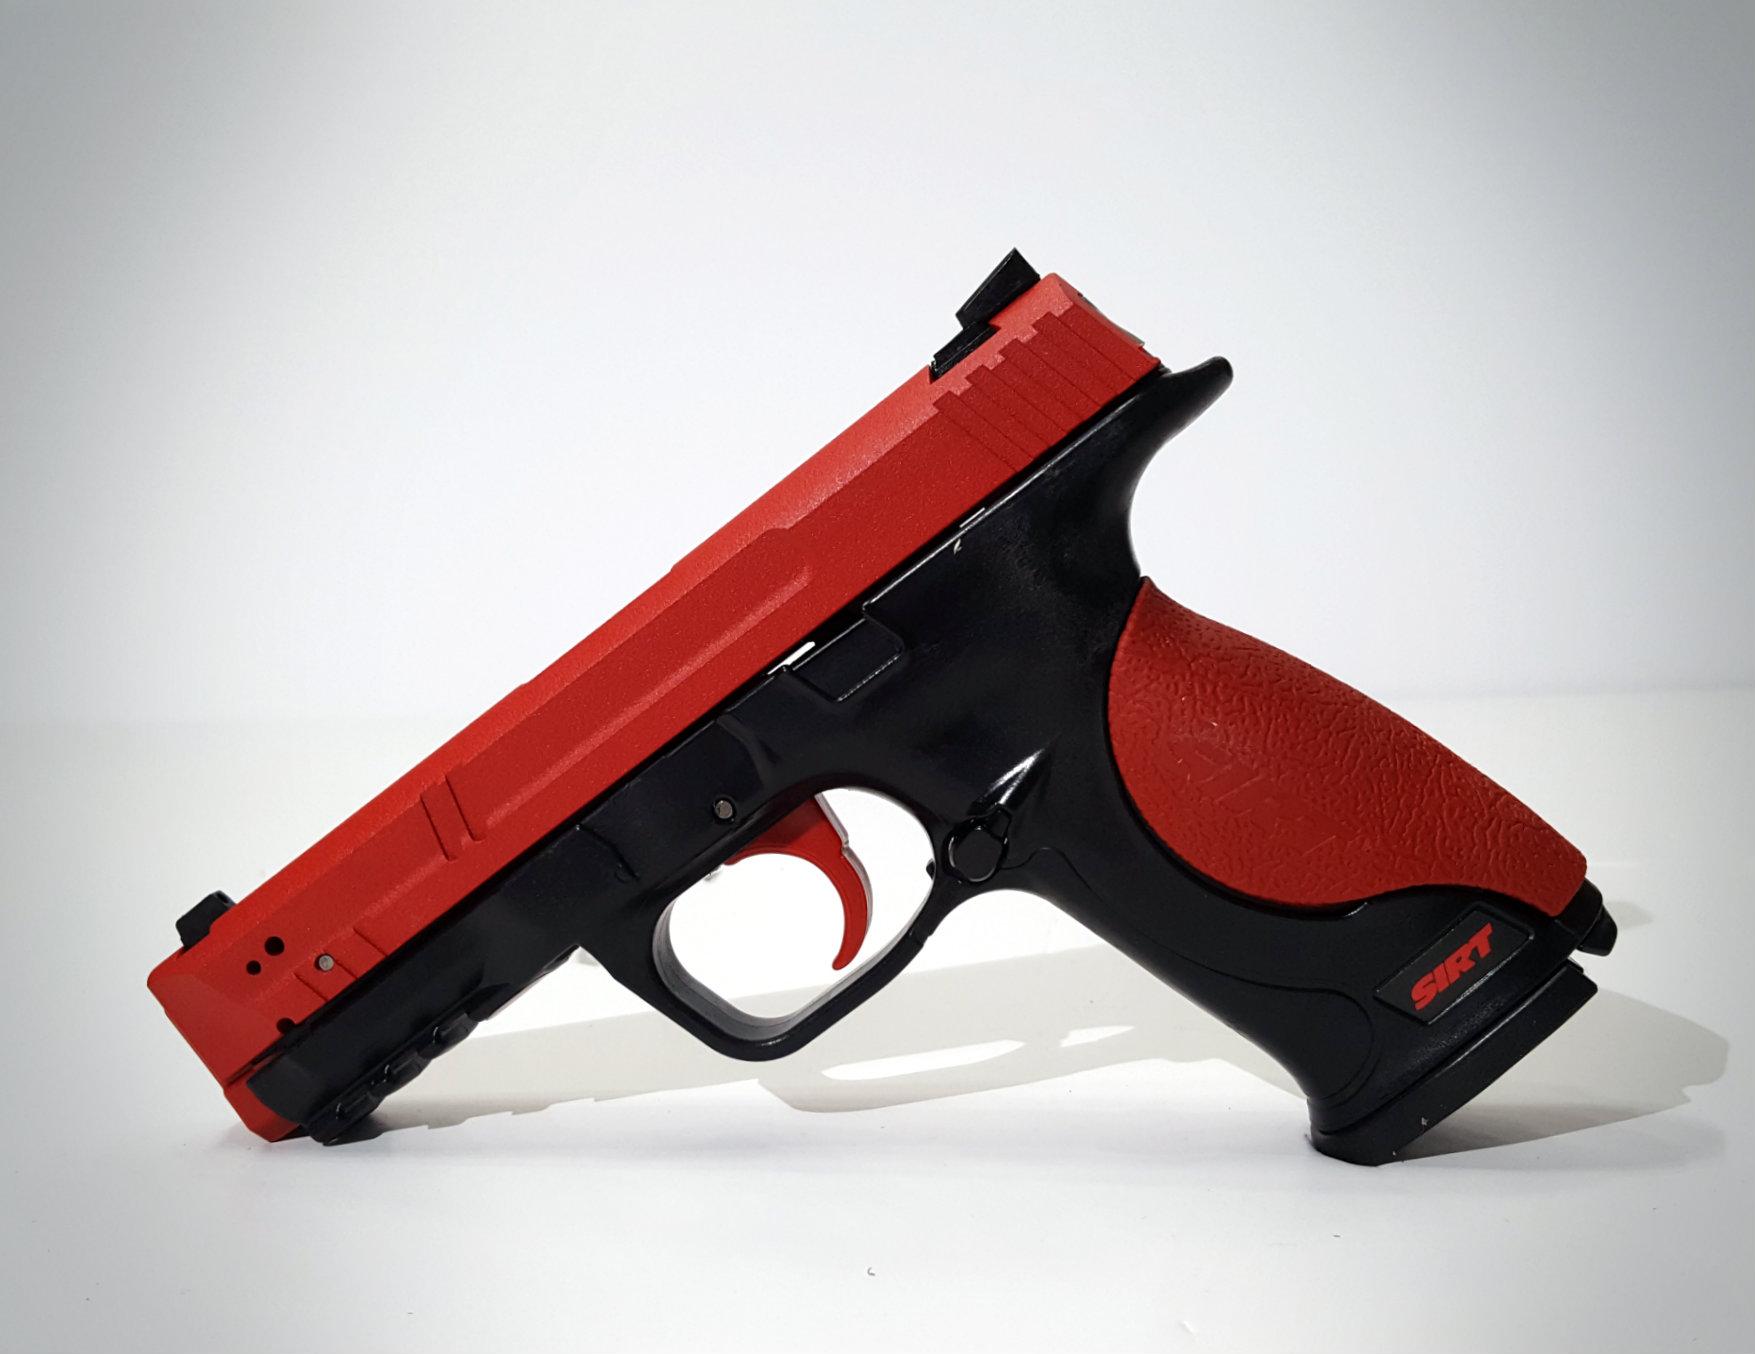 SIRT Training Pistols